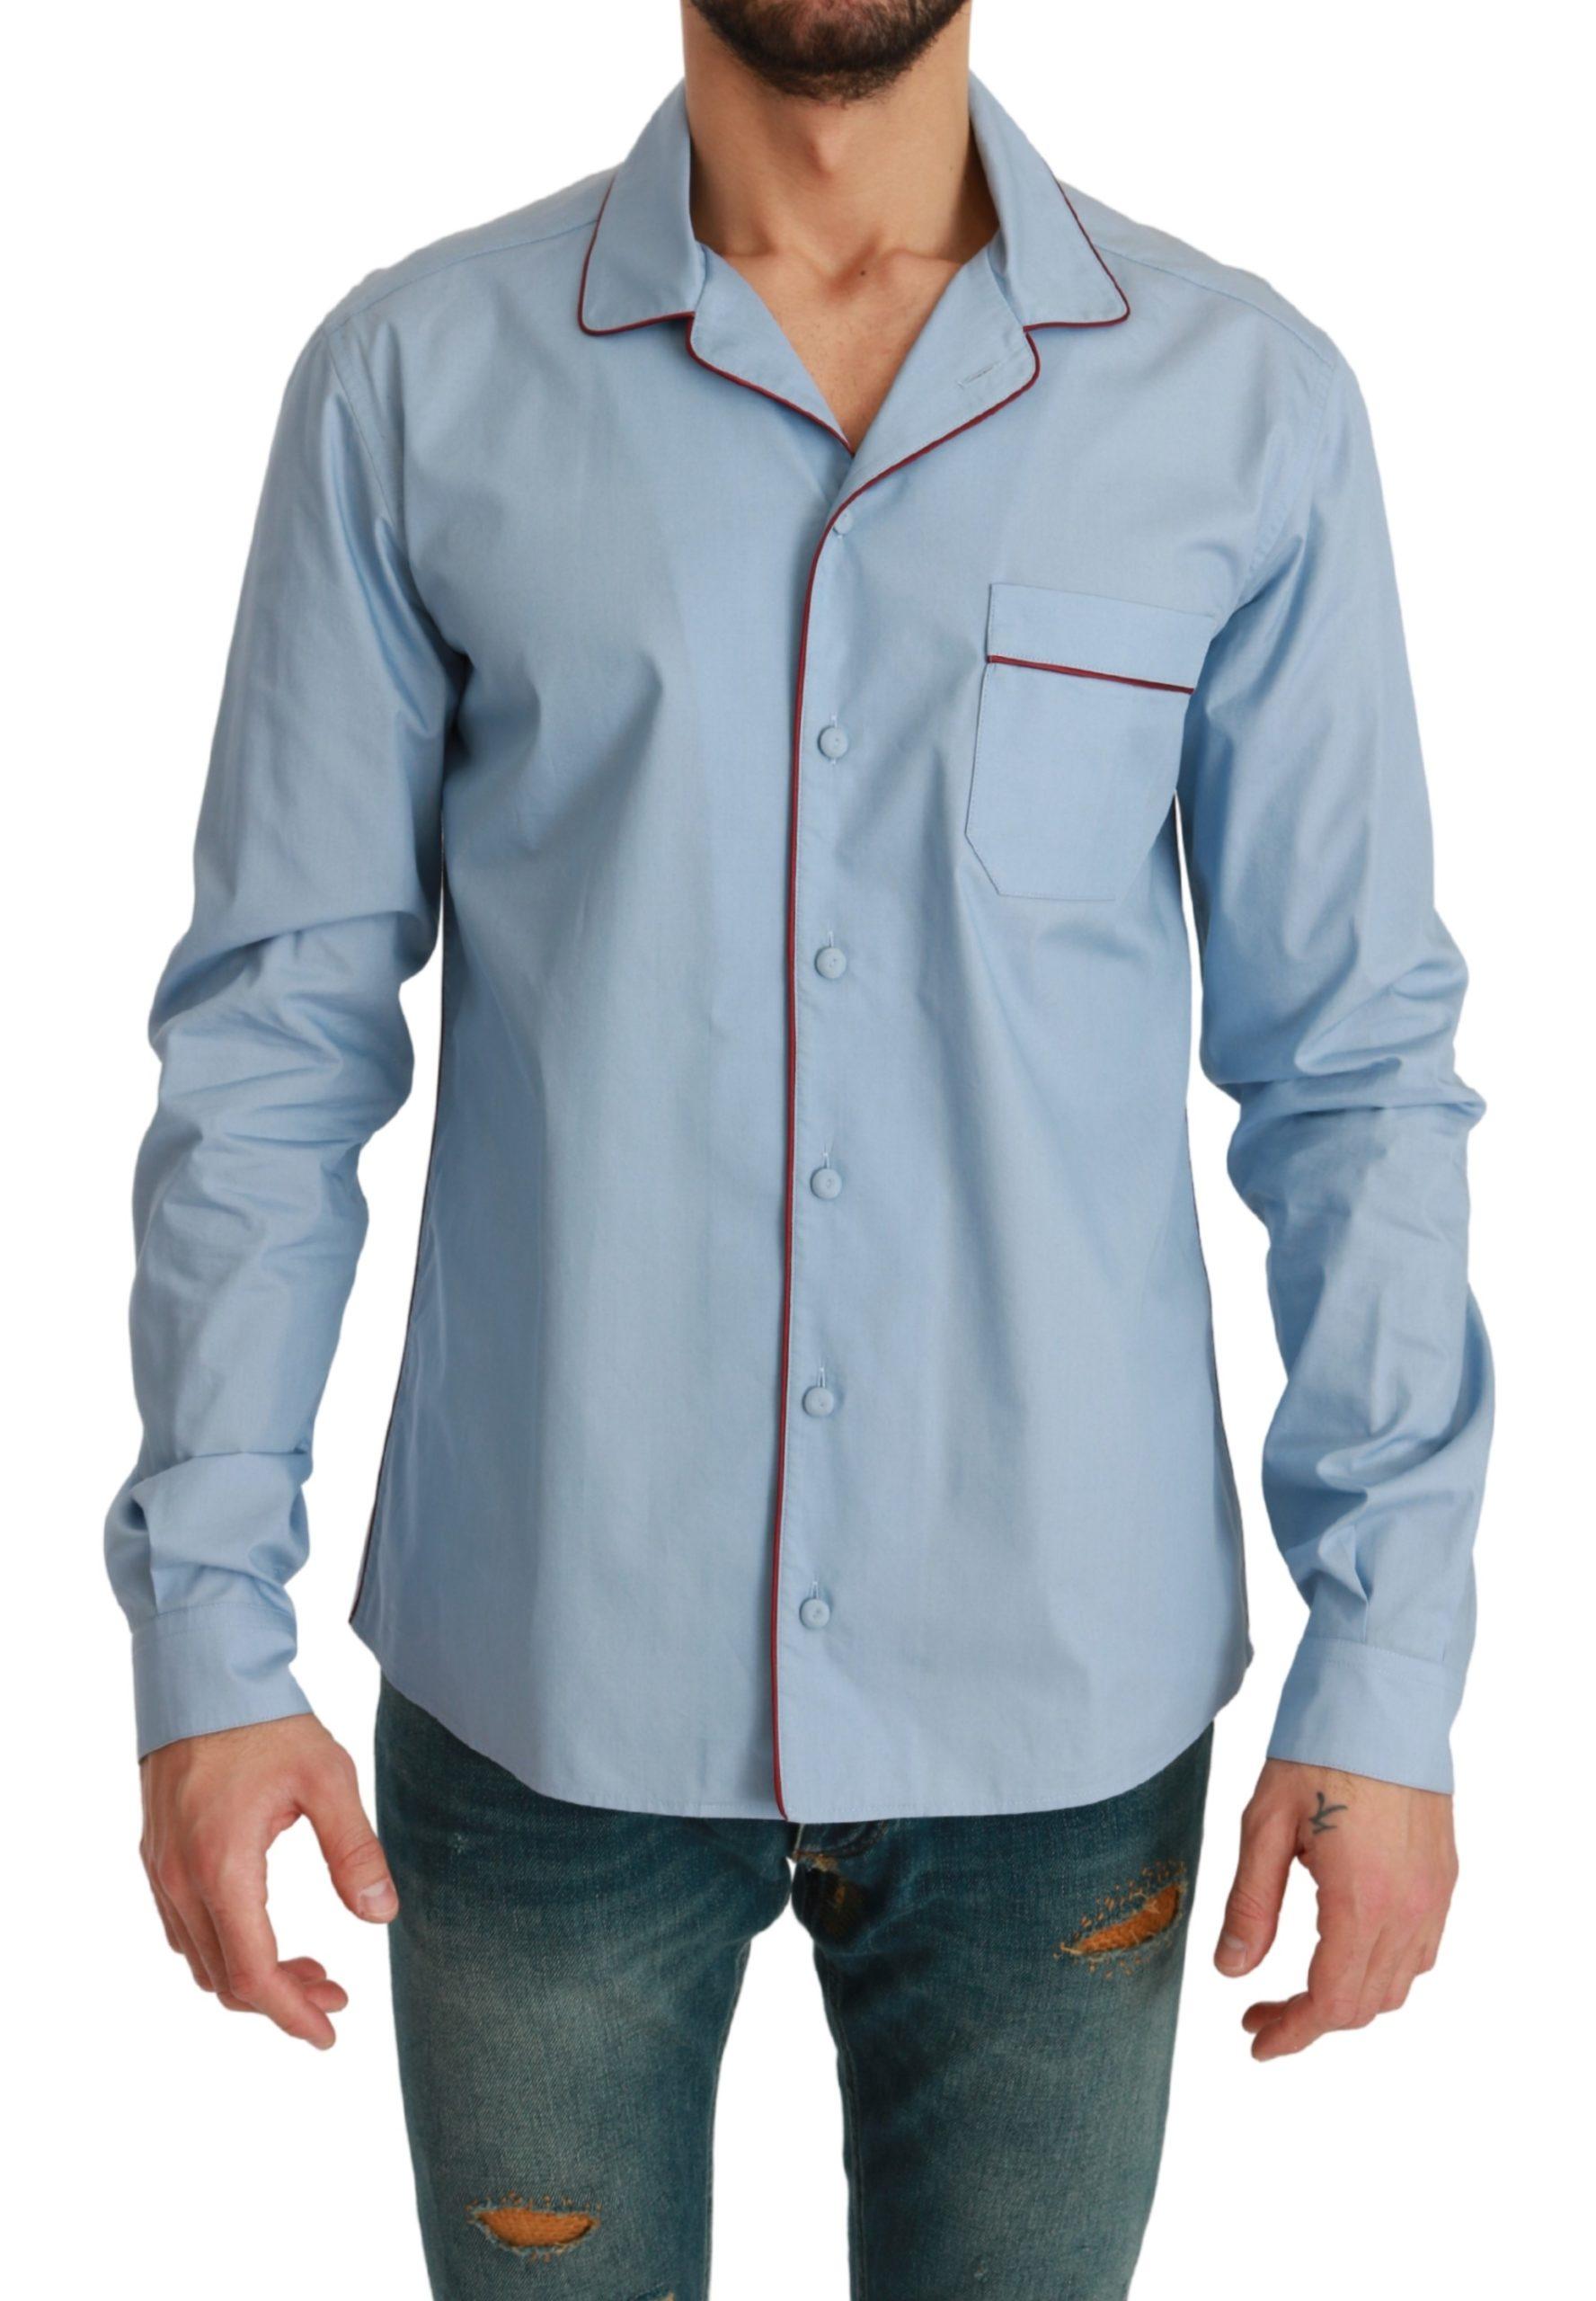 Dolce & Gabbana Men's Light Sleepwear Cotton Shirt Blue TSH4615 - IT40   M